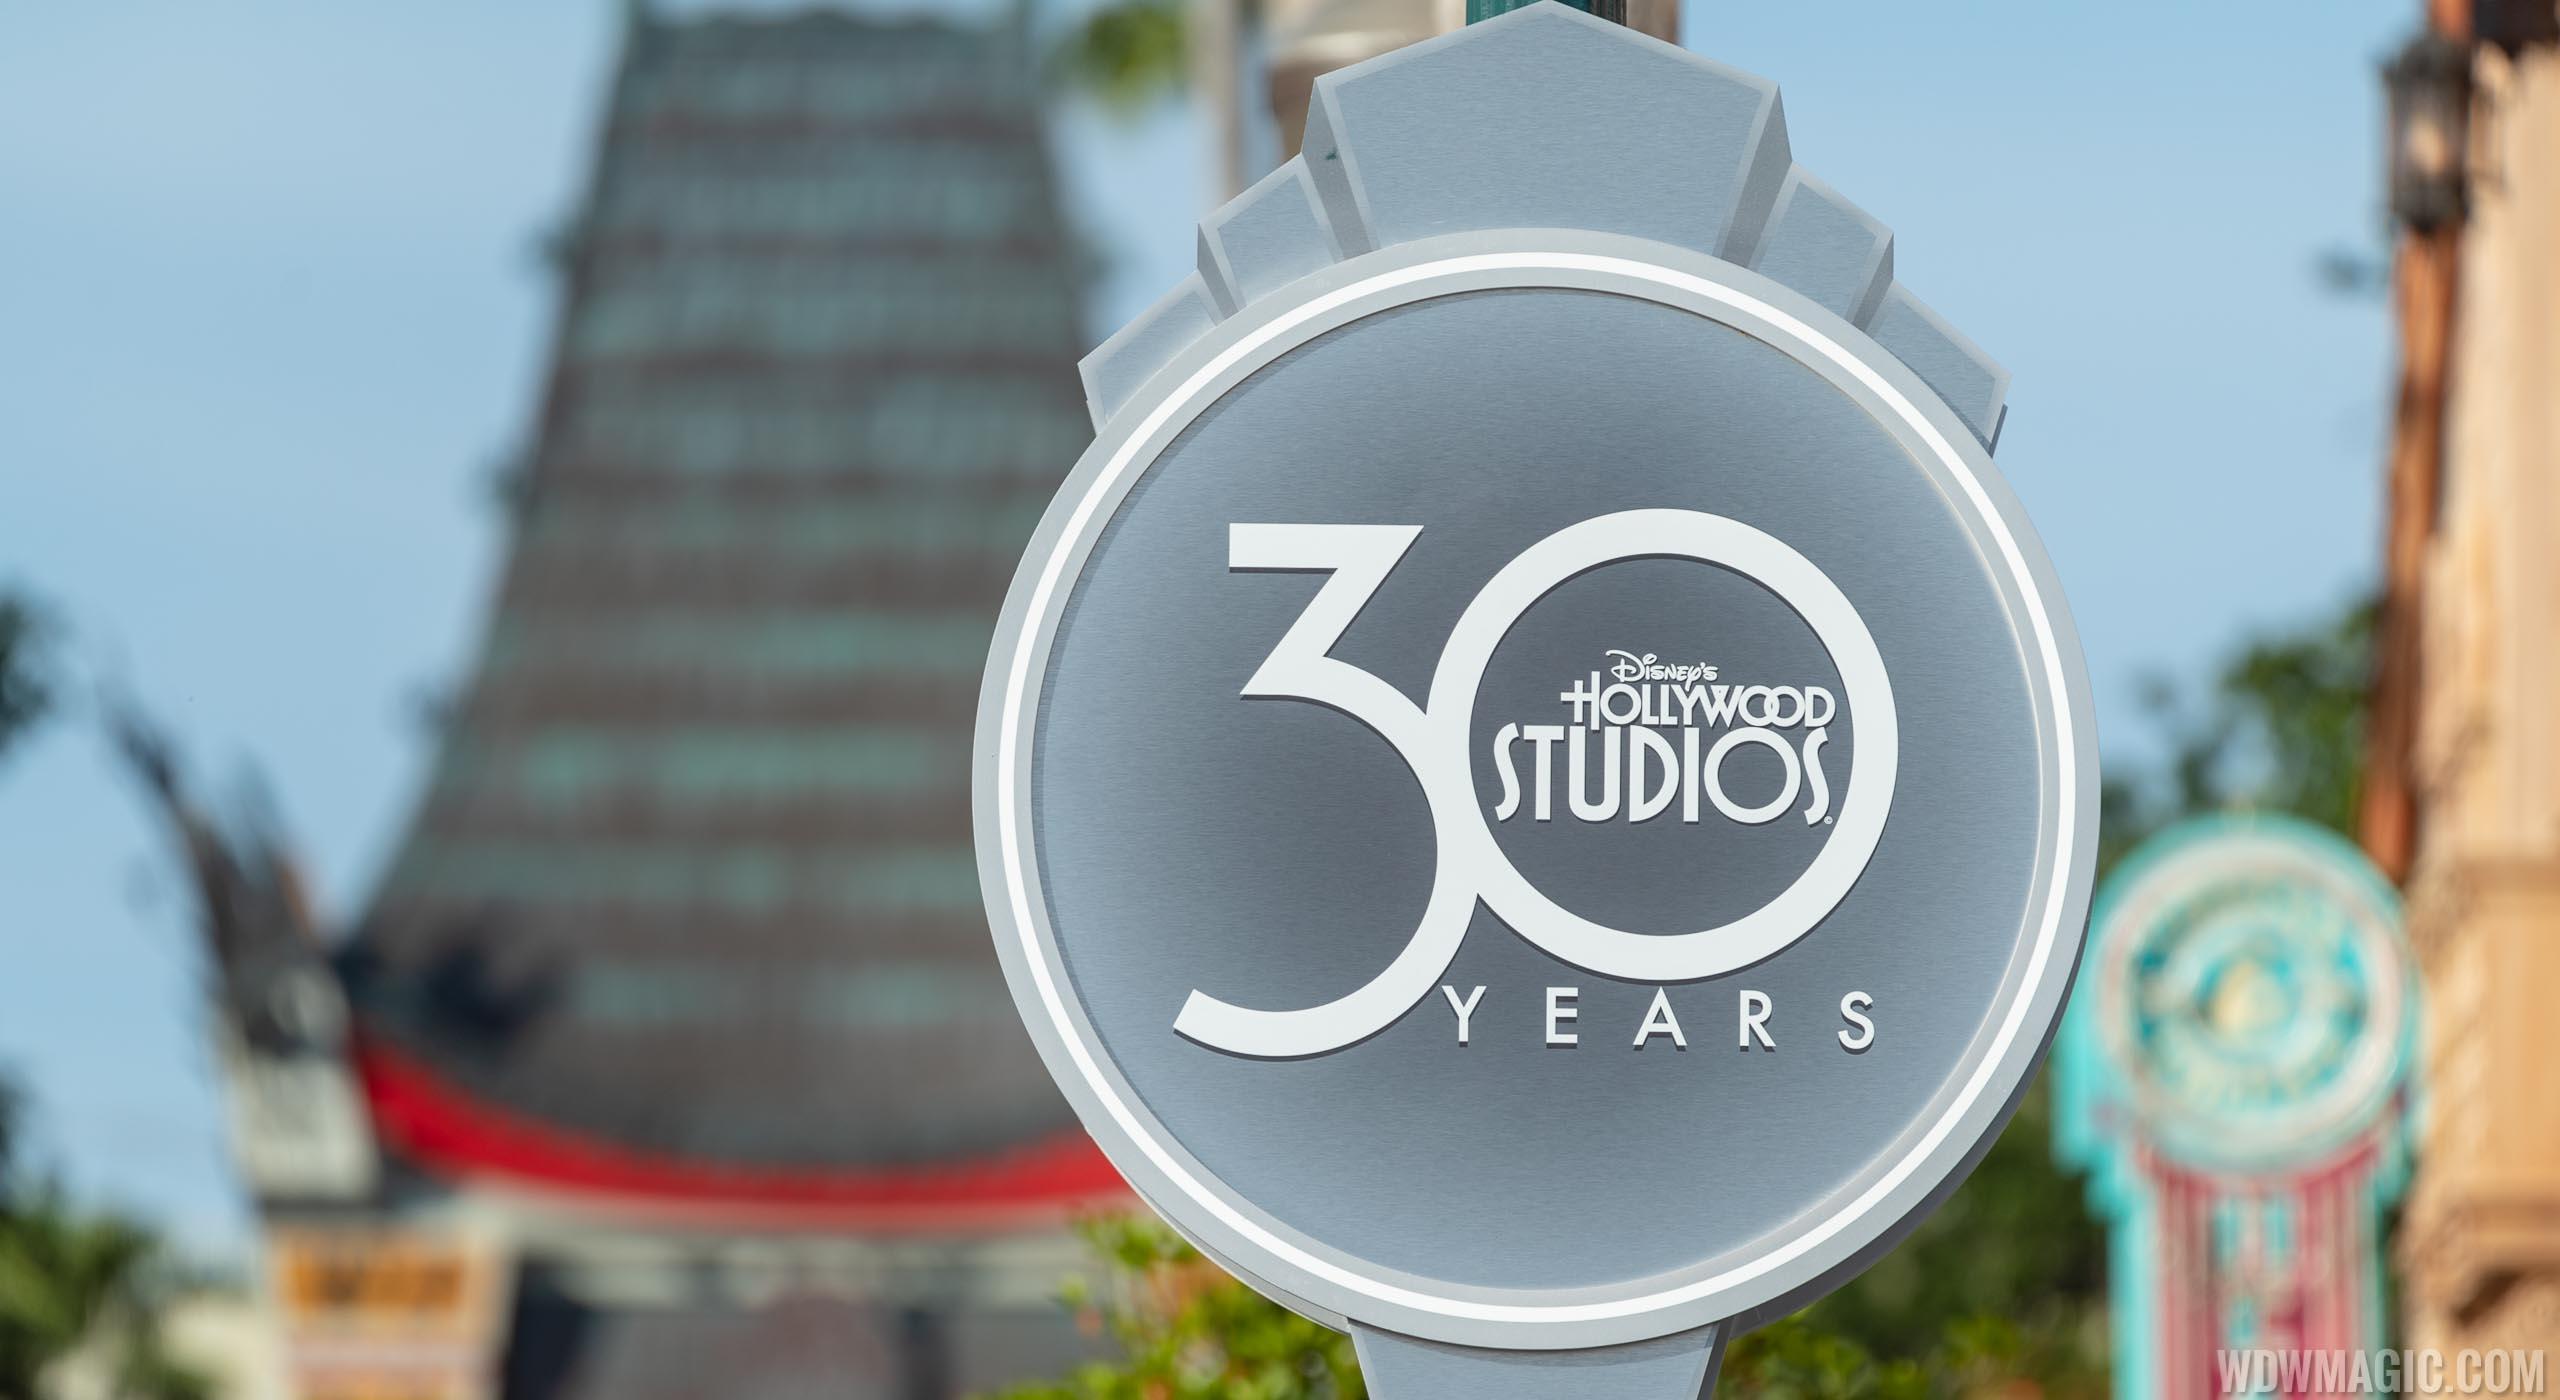 Happy 30th Anniversary Disney's Hollywood Studios